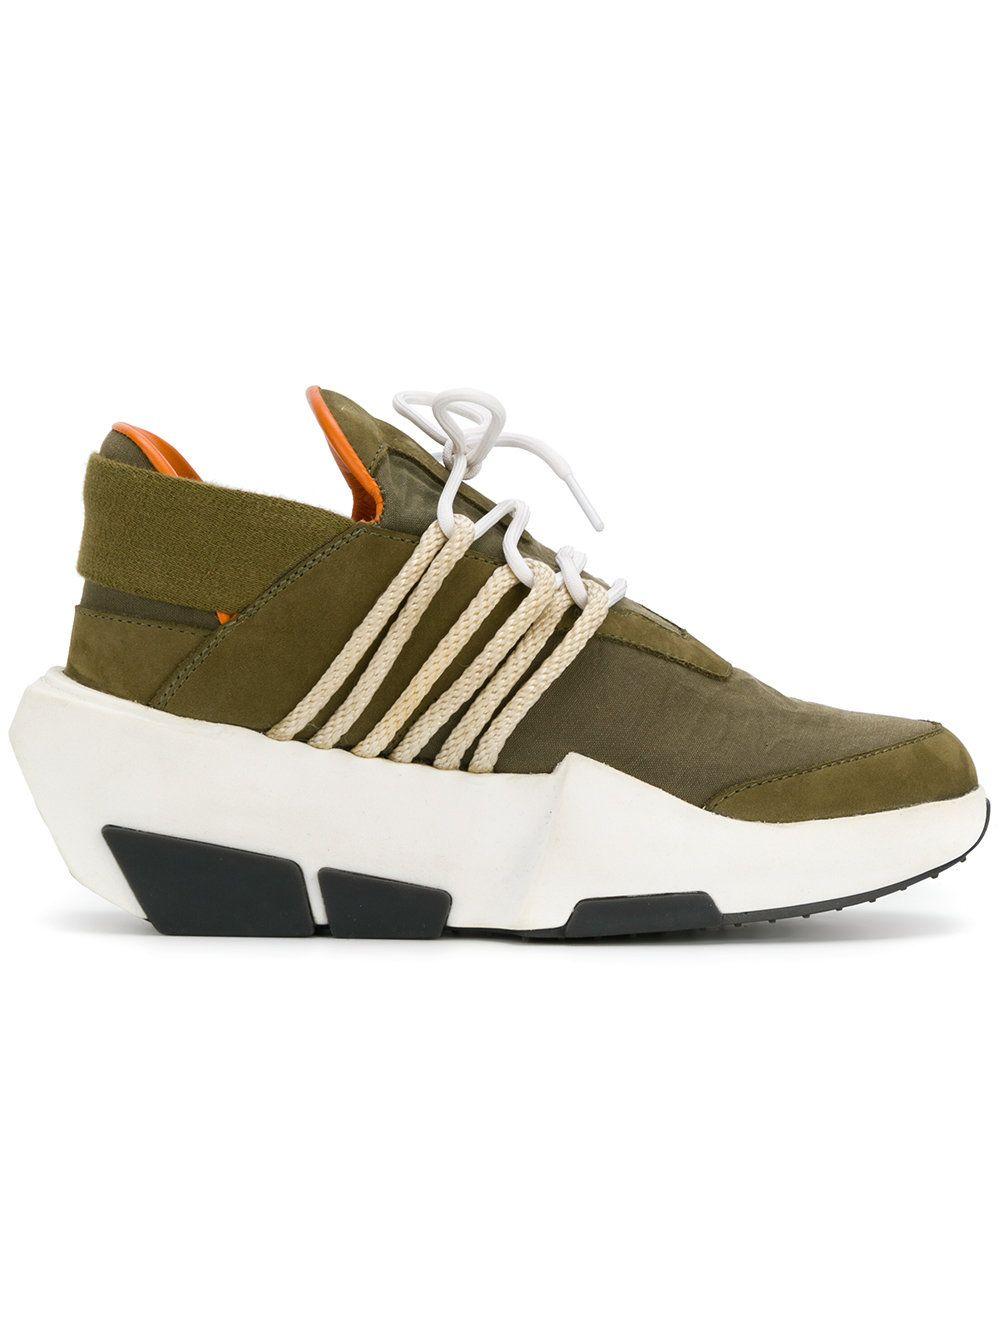 c9fdaa0ca The Shoe Surgeon Farfetch x The Shoe Surgeon Y3 Mira sneakers